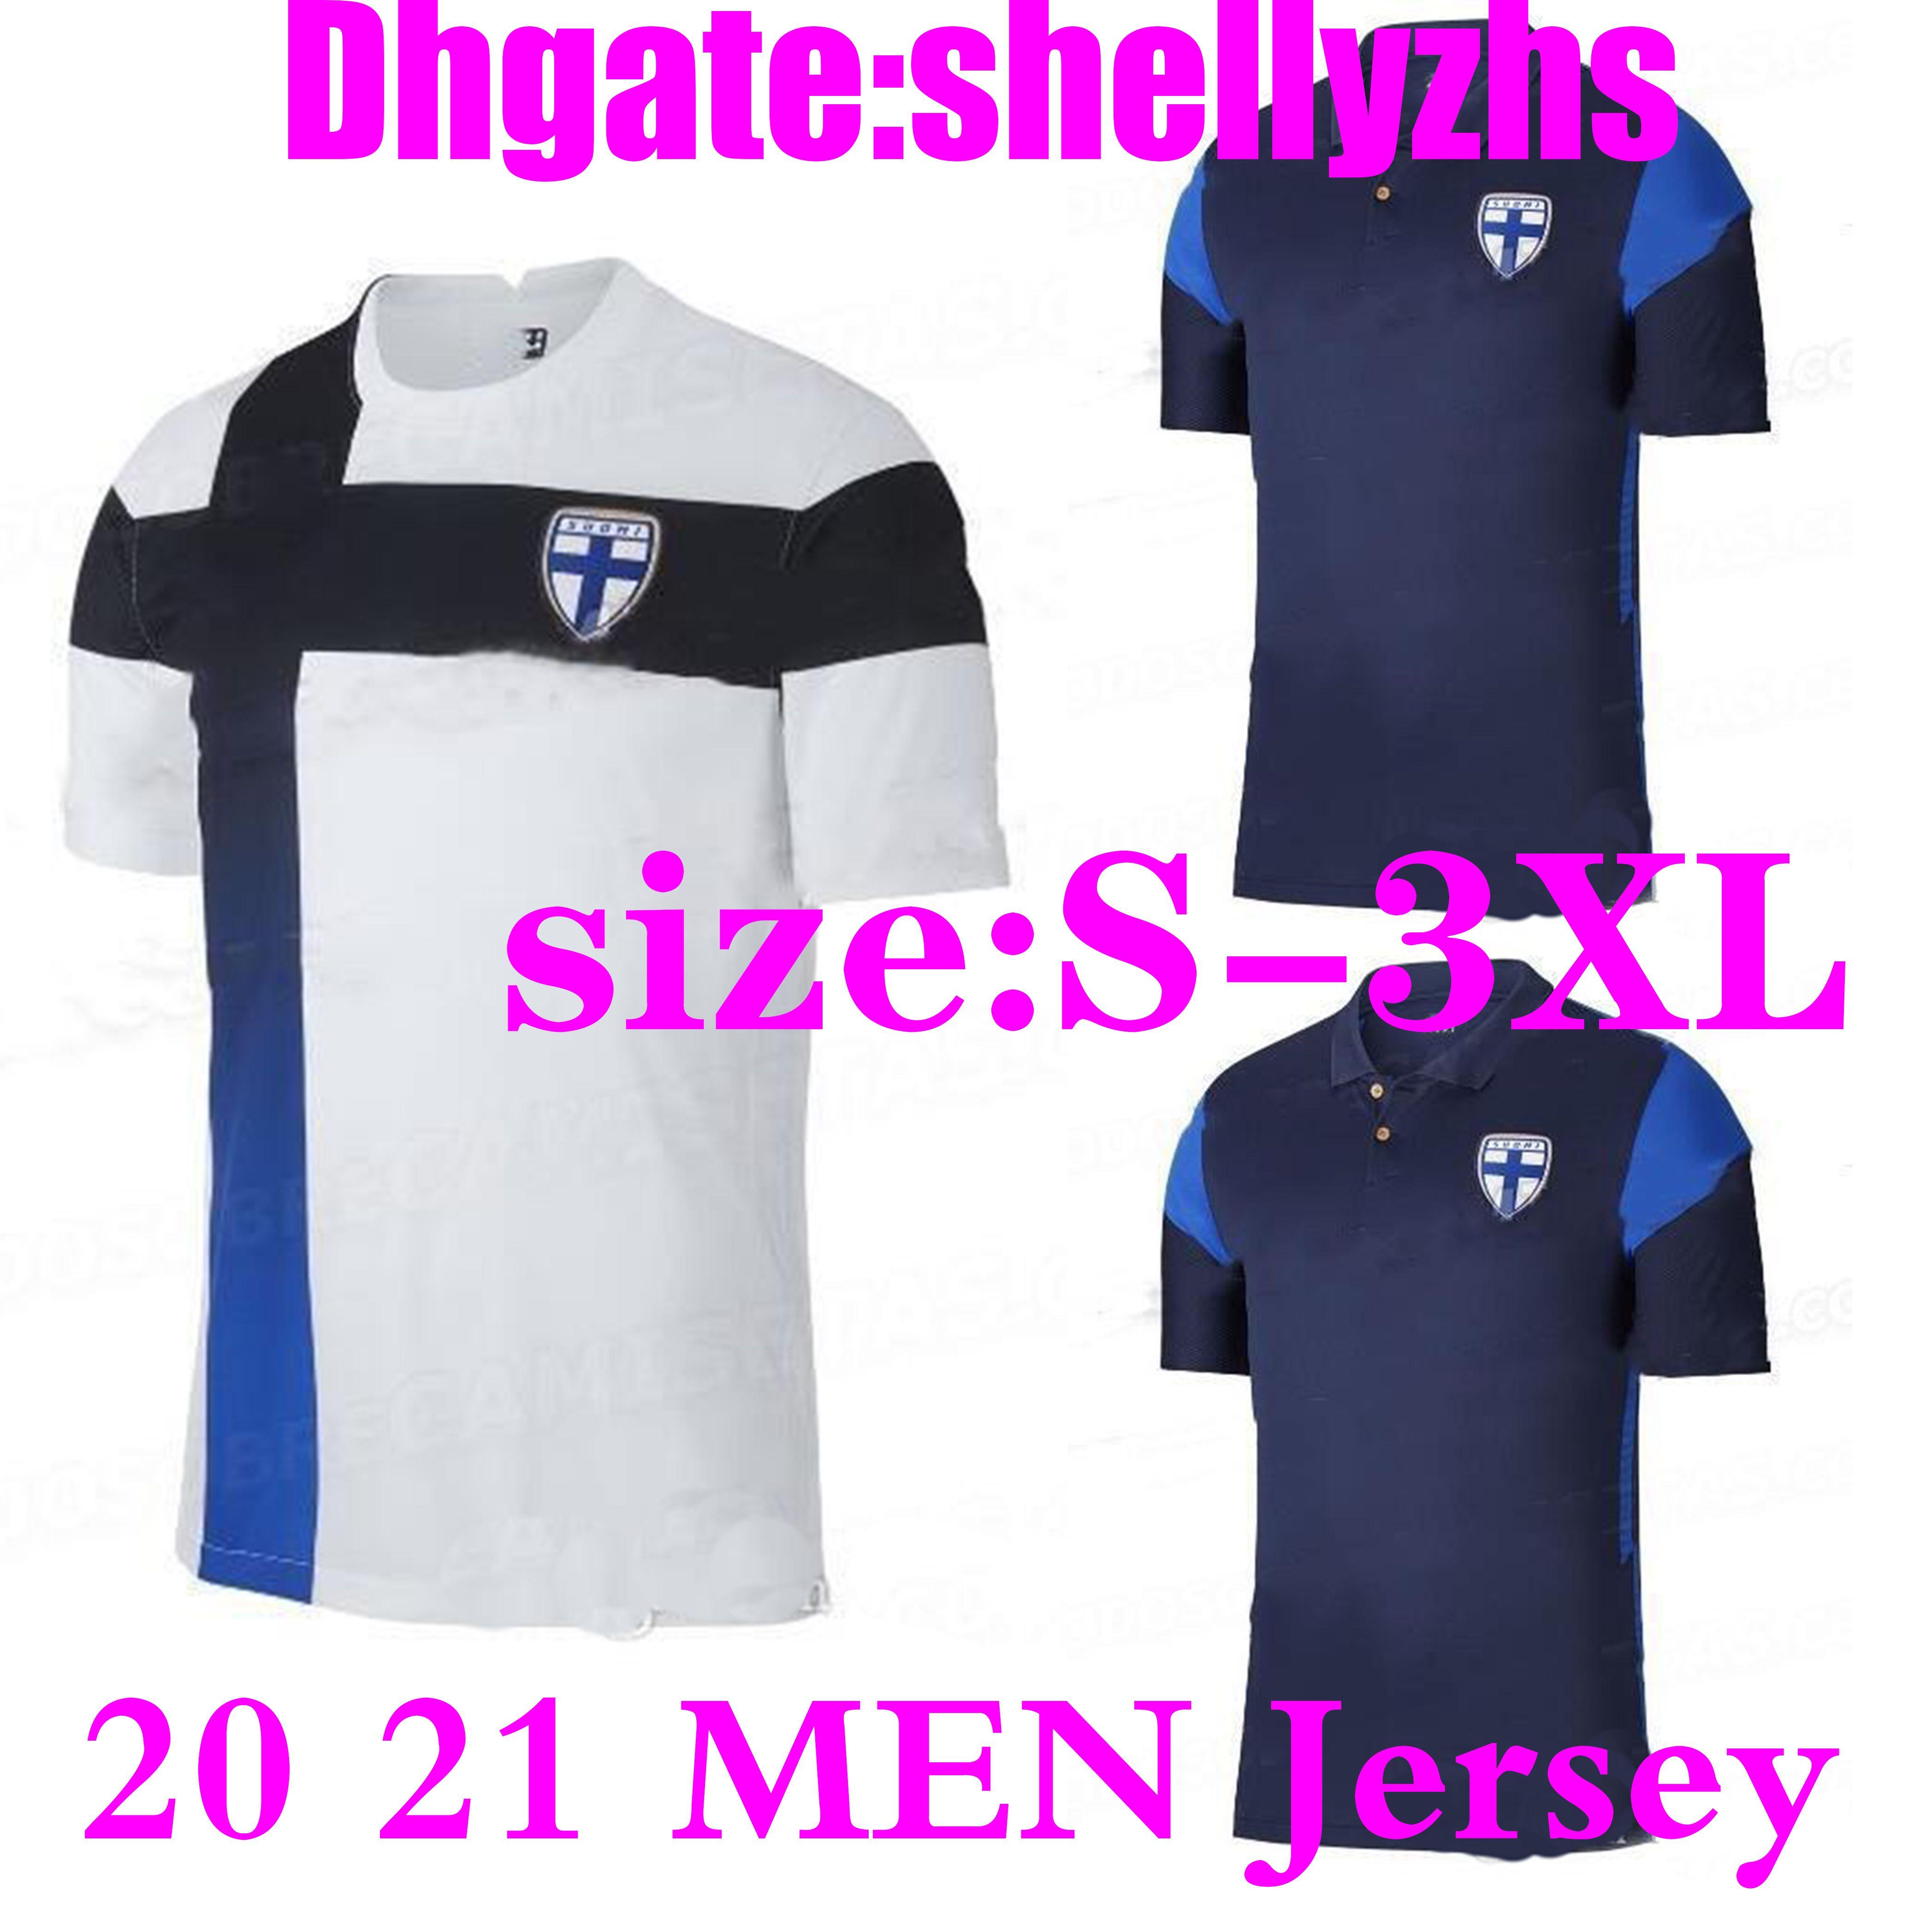 размер:S-3XL лучшее качество 20 21 Finland soccer jersey 2020 men home white PUKKI KEMPPI ENGMAN Jersey HRADECKY футбольная форма рубашки